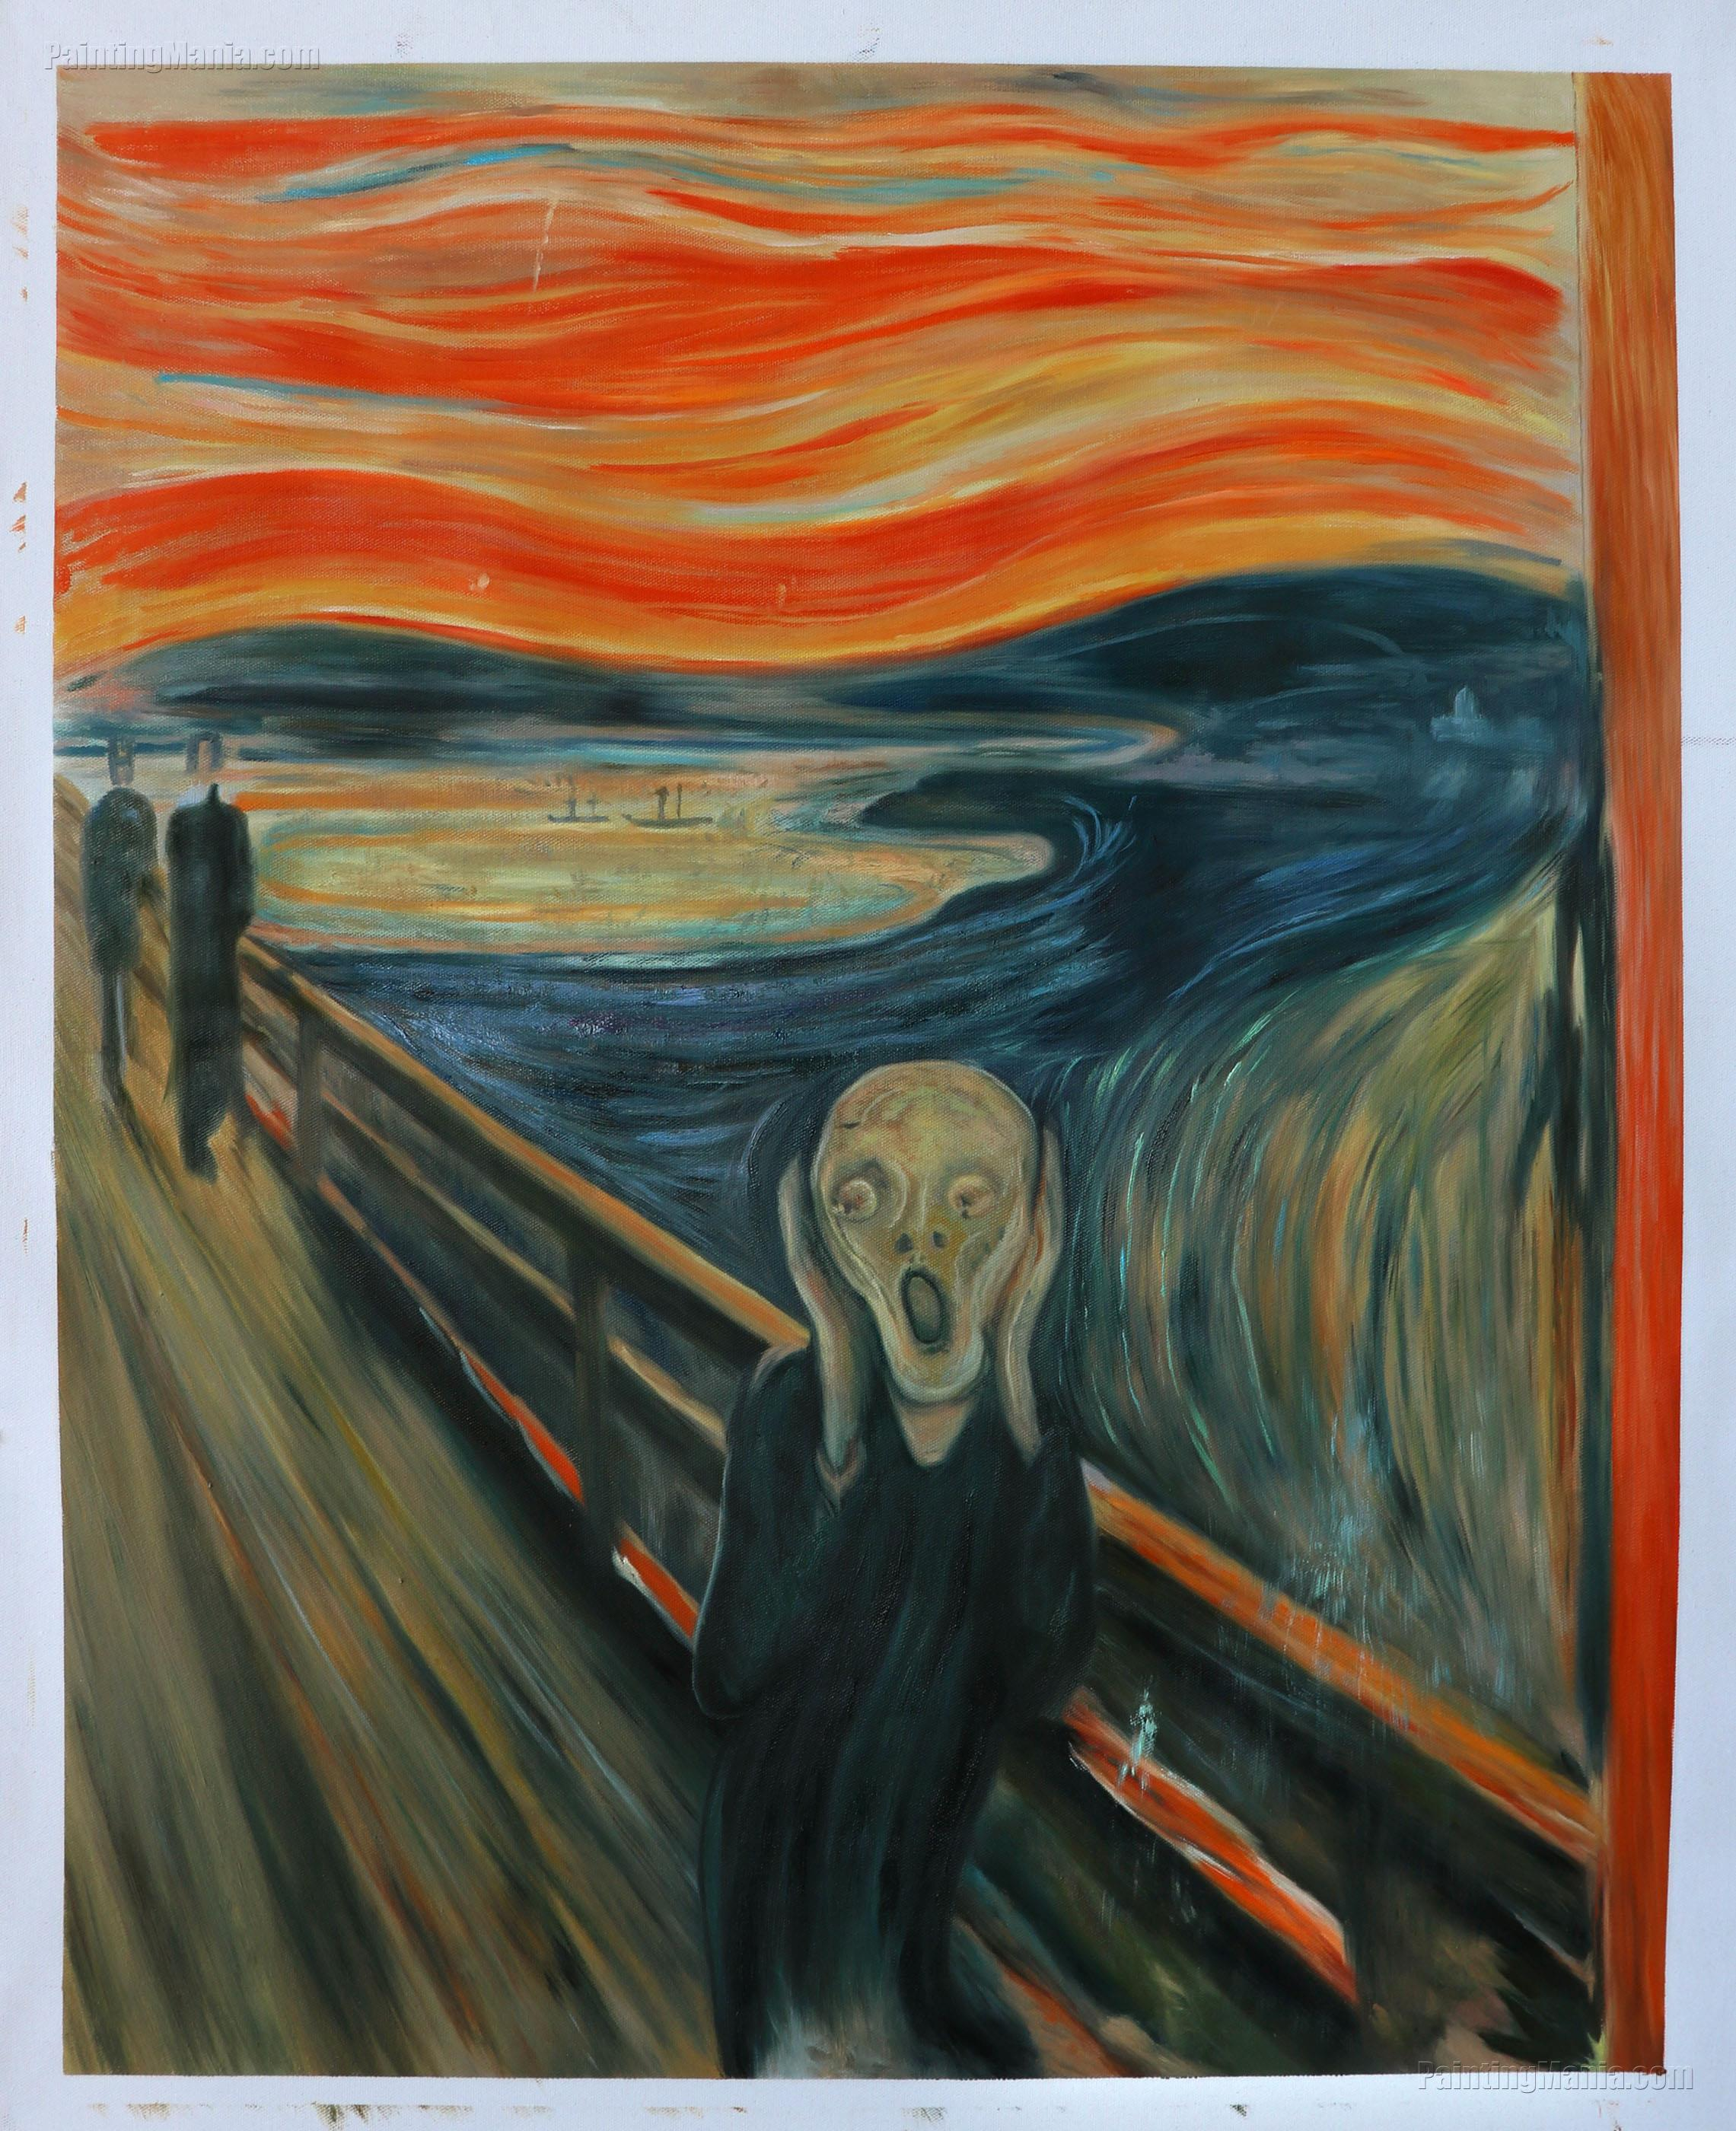 The Scream 1893 - Edvard Munch Paintings